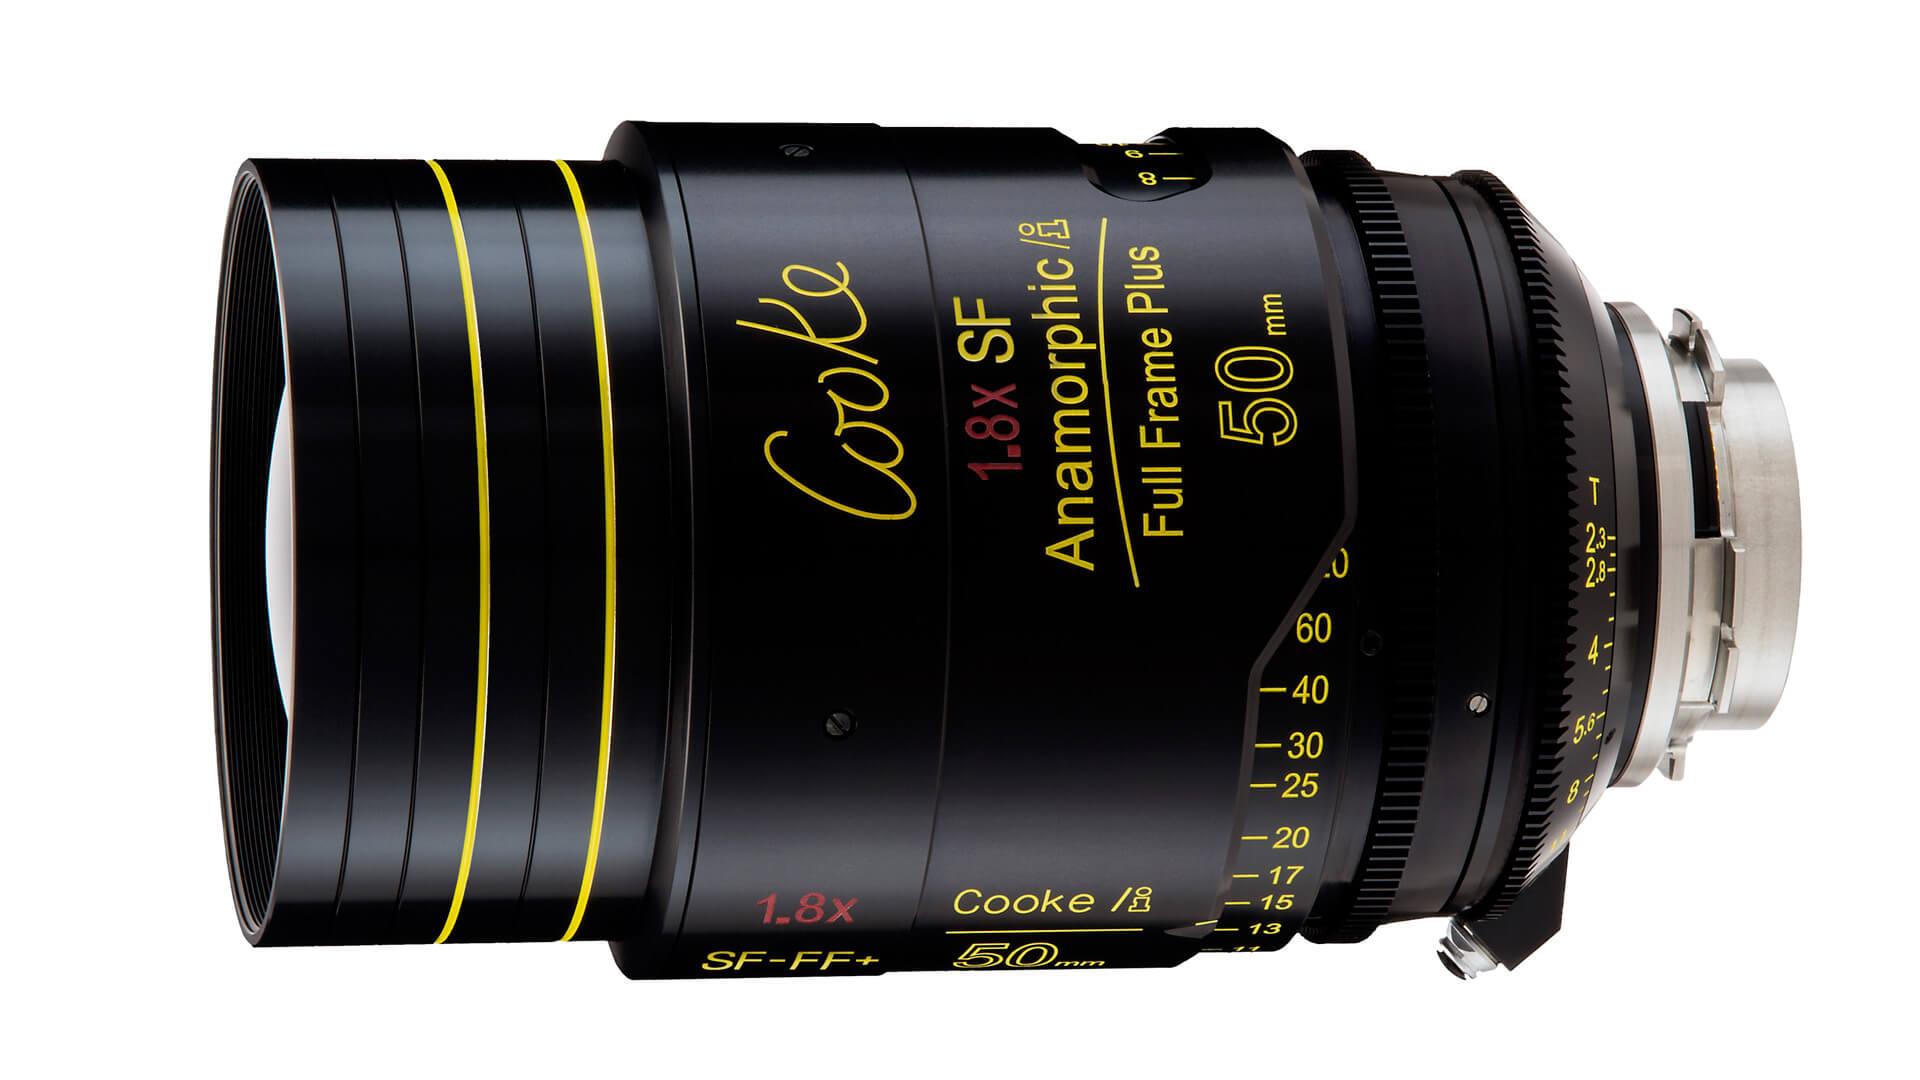 Cooke Anamorphic 1.8x SF full frame lens